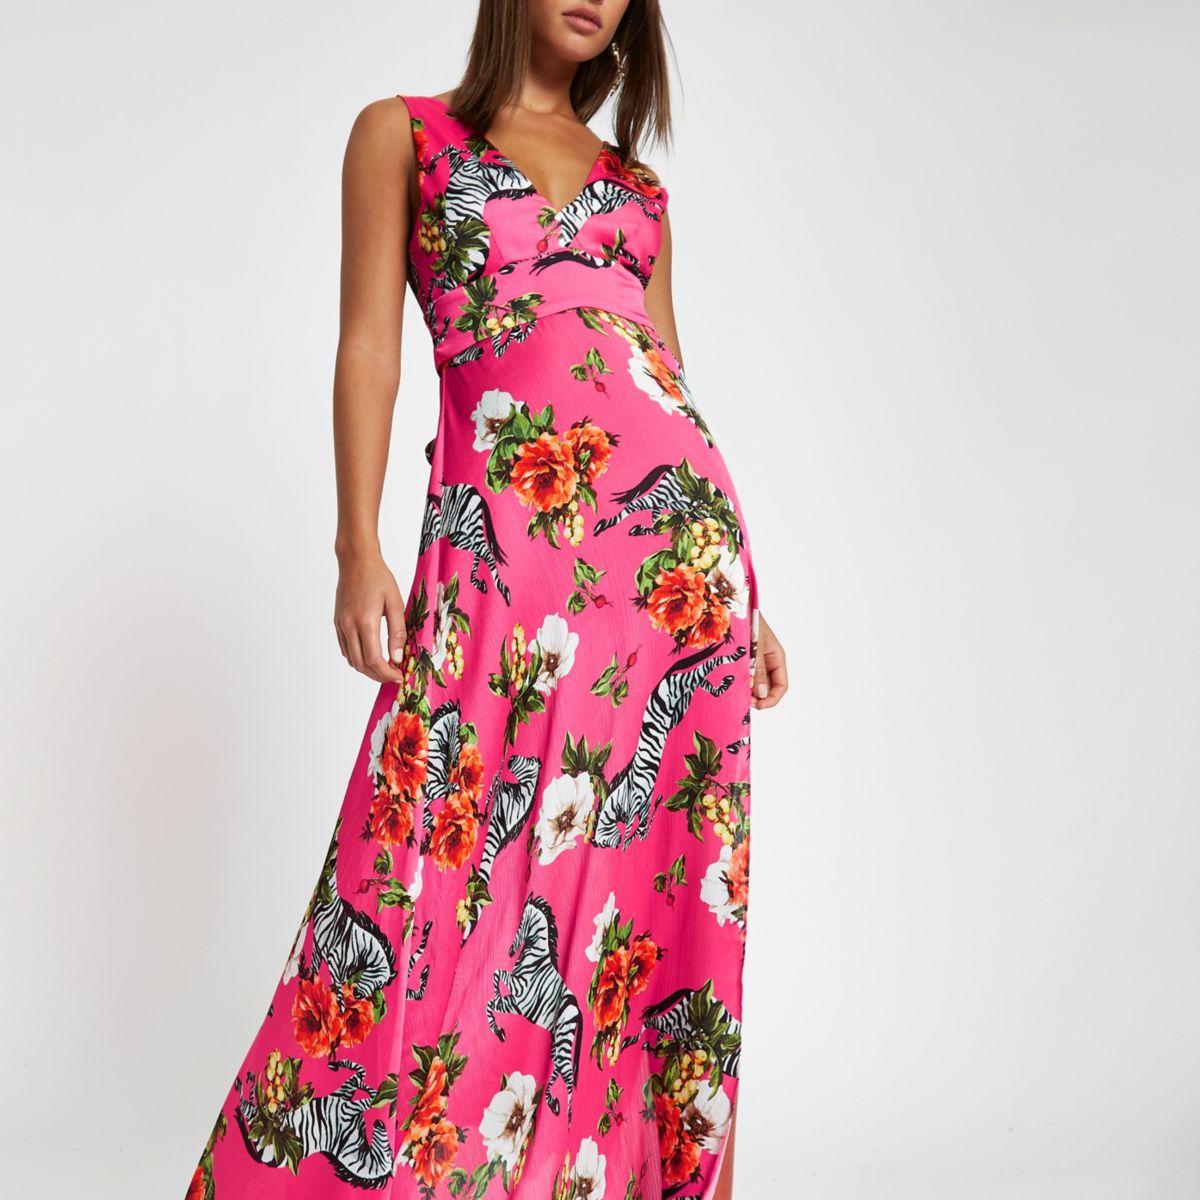 Pink zebra print halter maxi dress